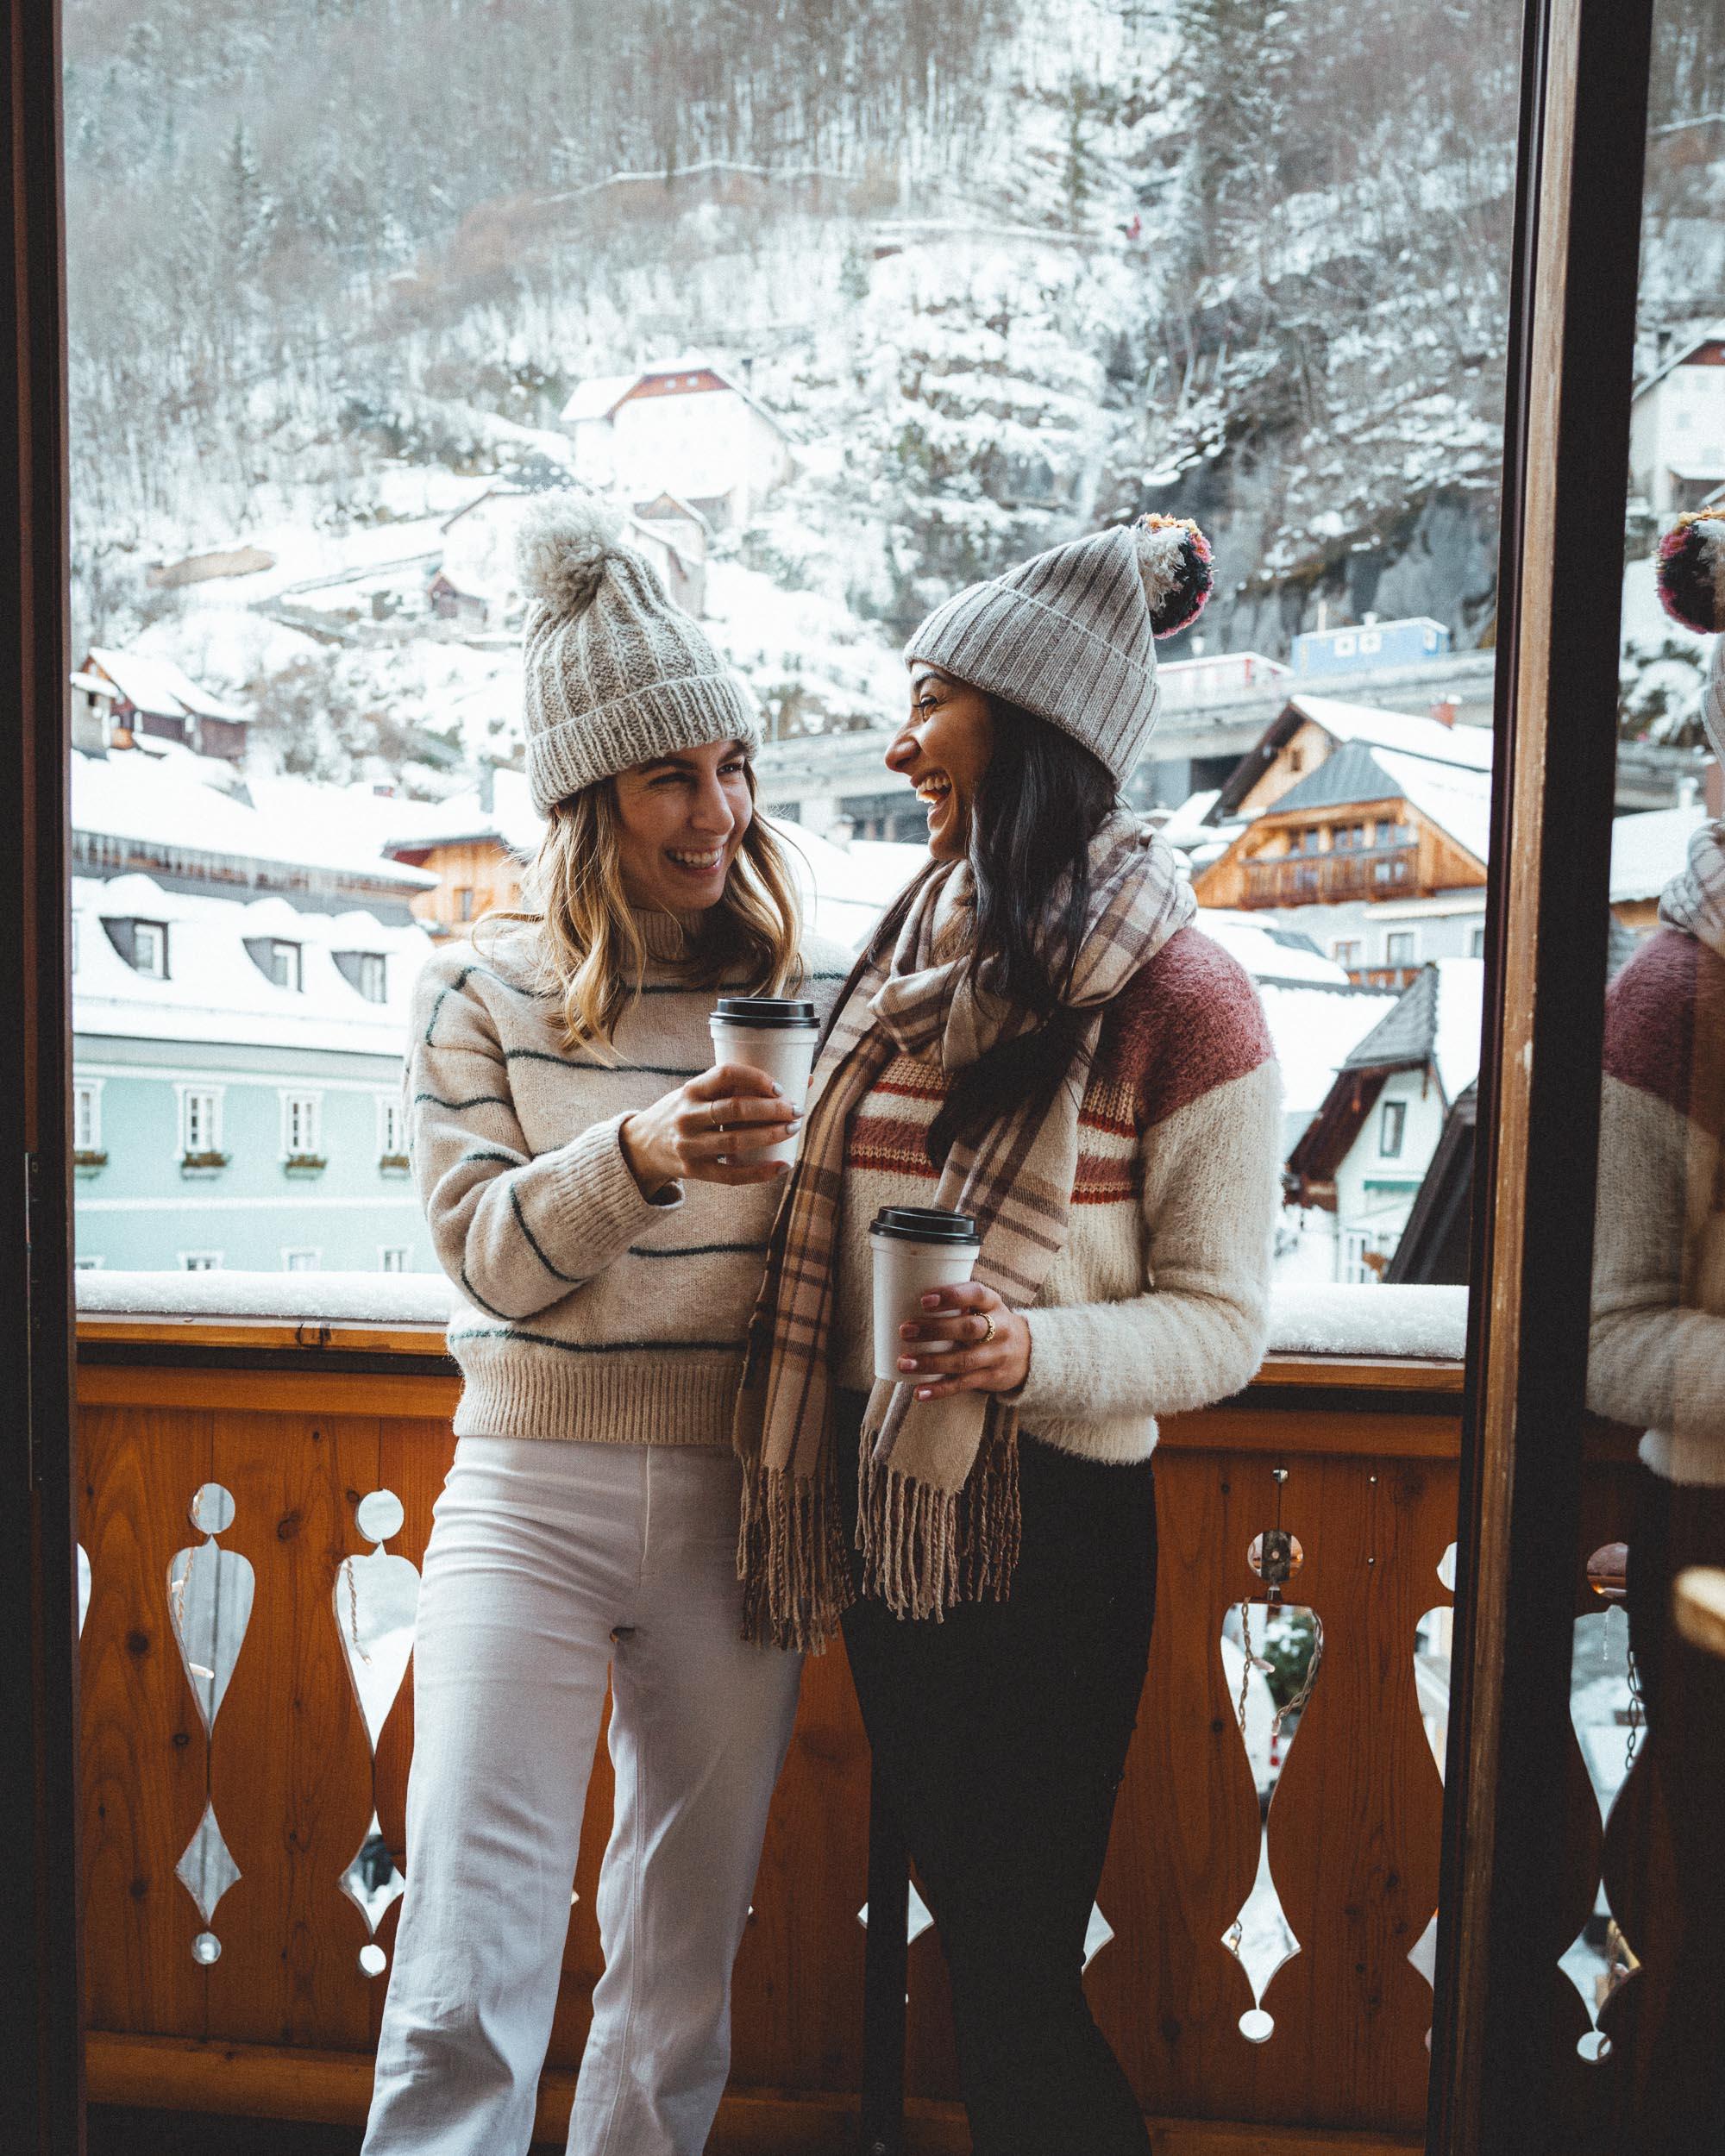 On our balcony at seehotel gruner baum in Hallstatt for a girls trip